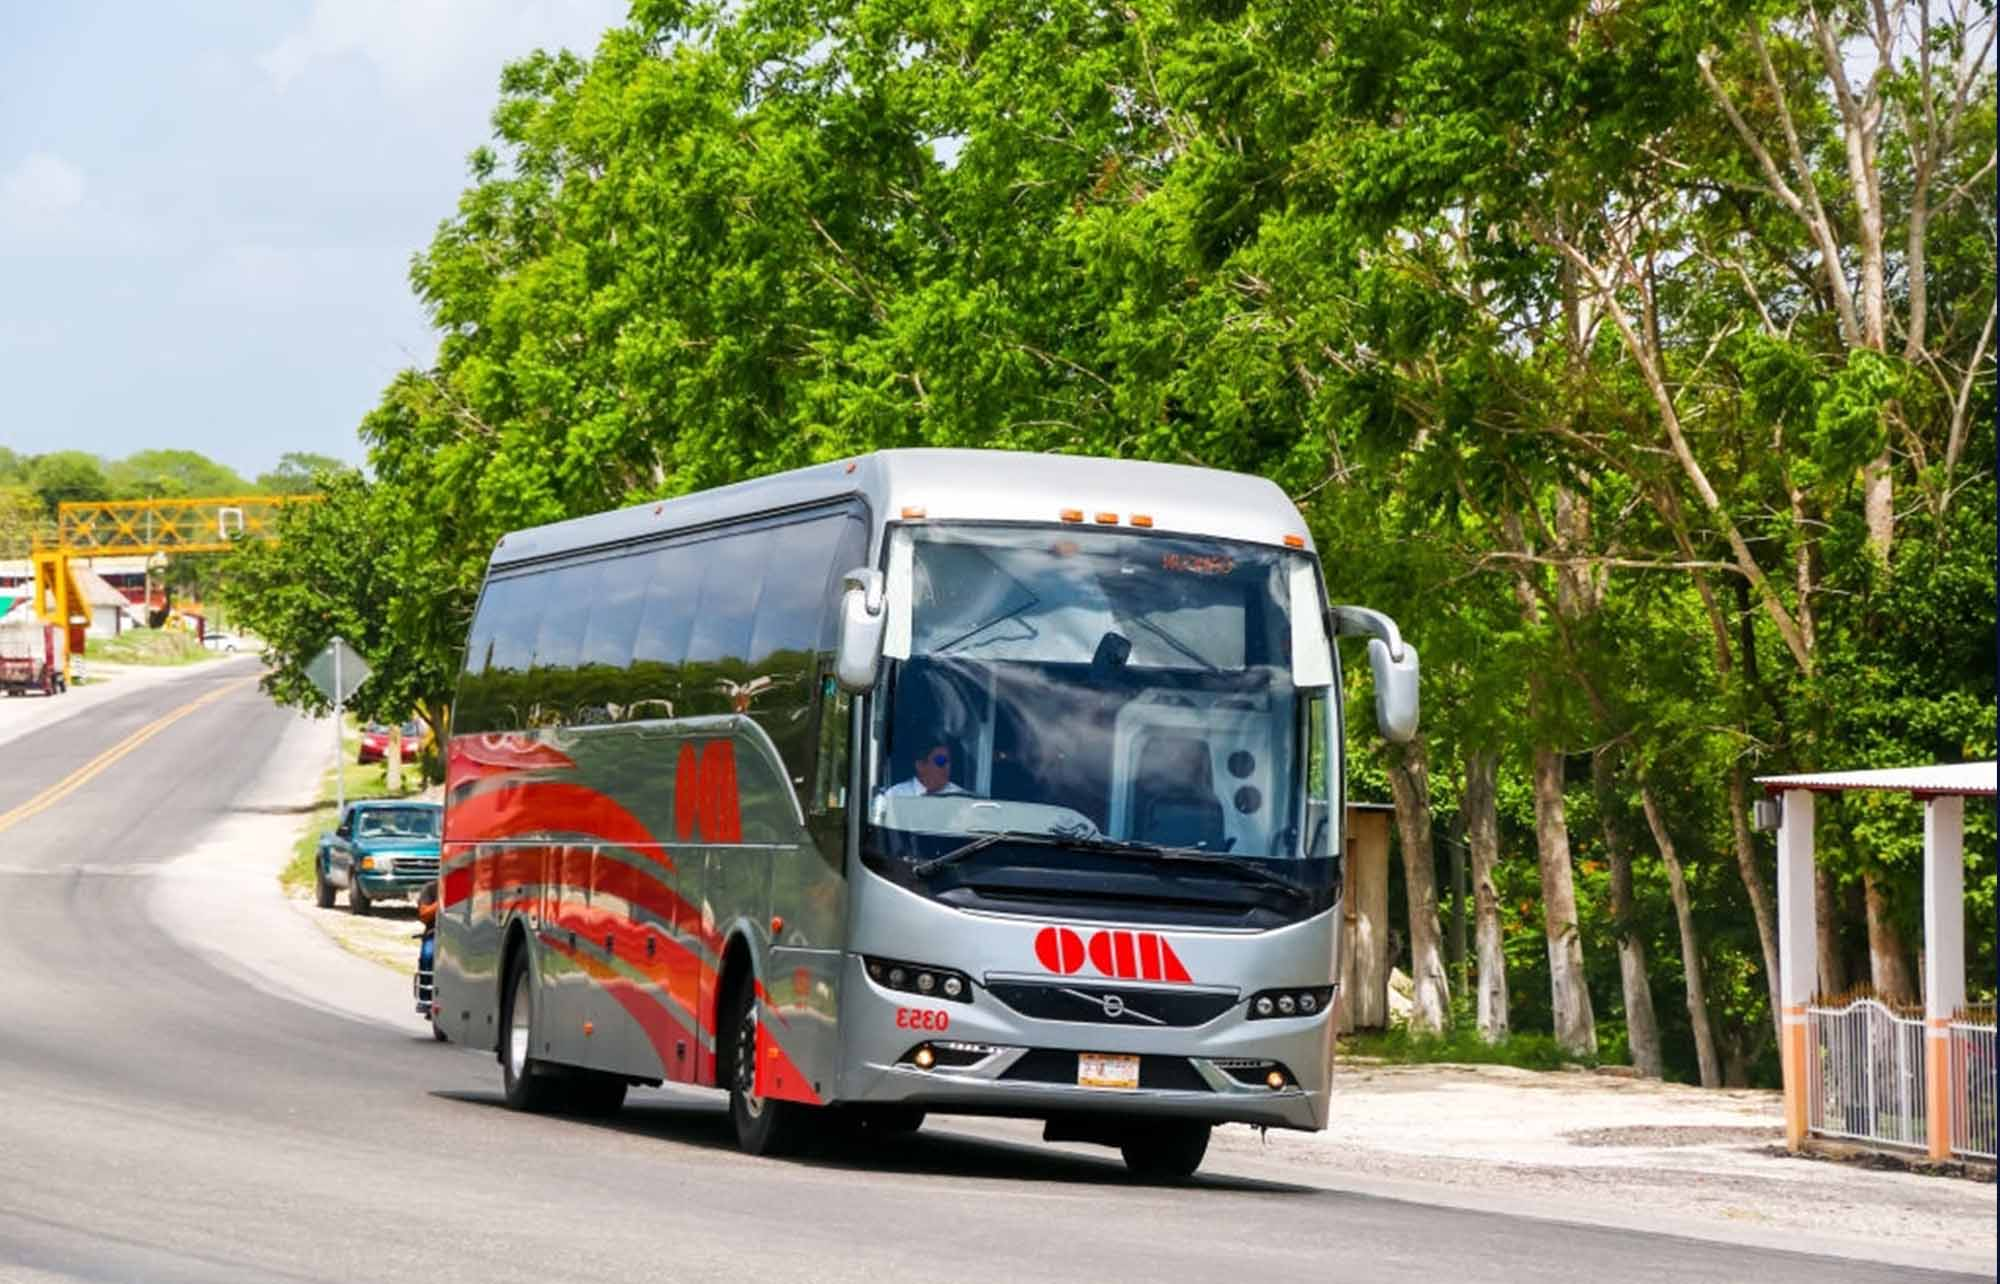 aller à holbox en bus